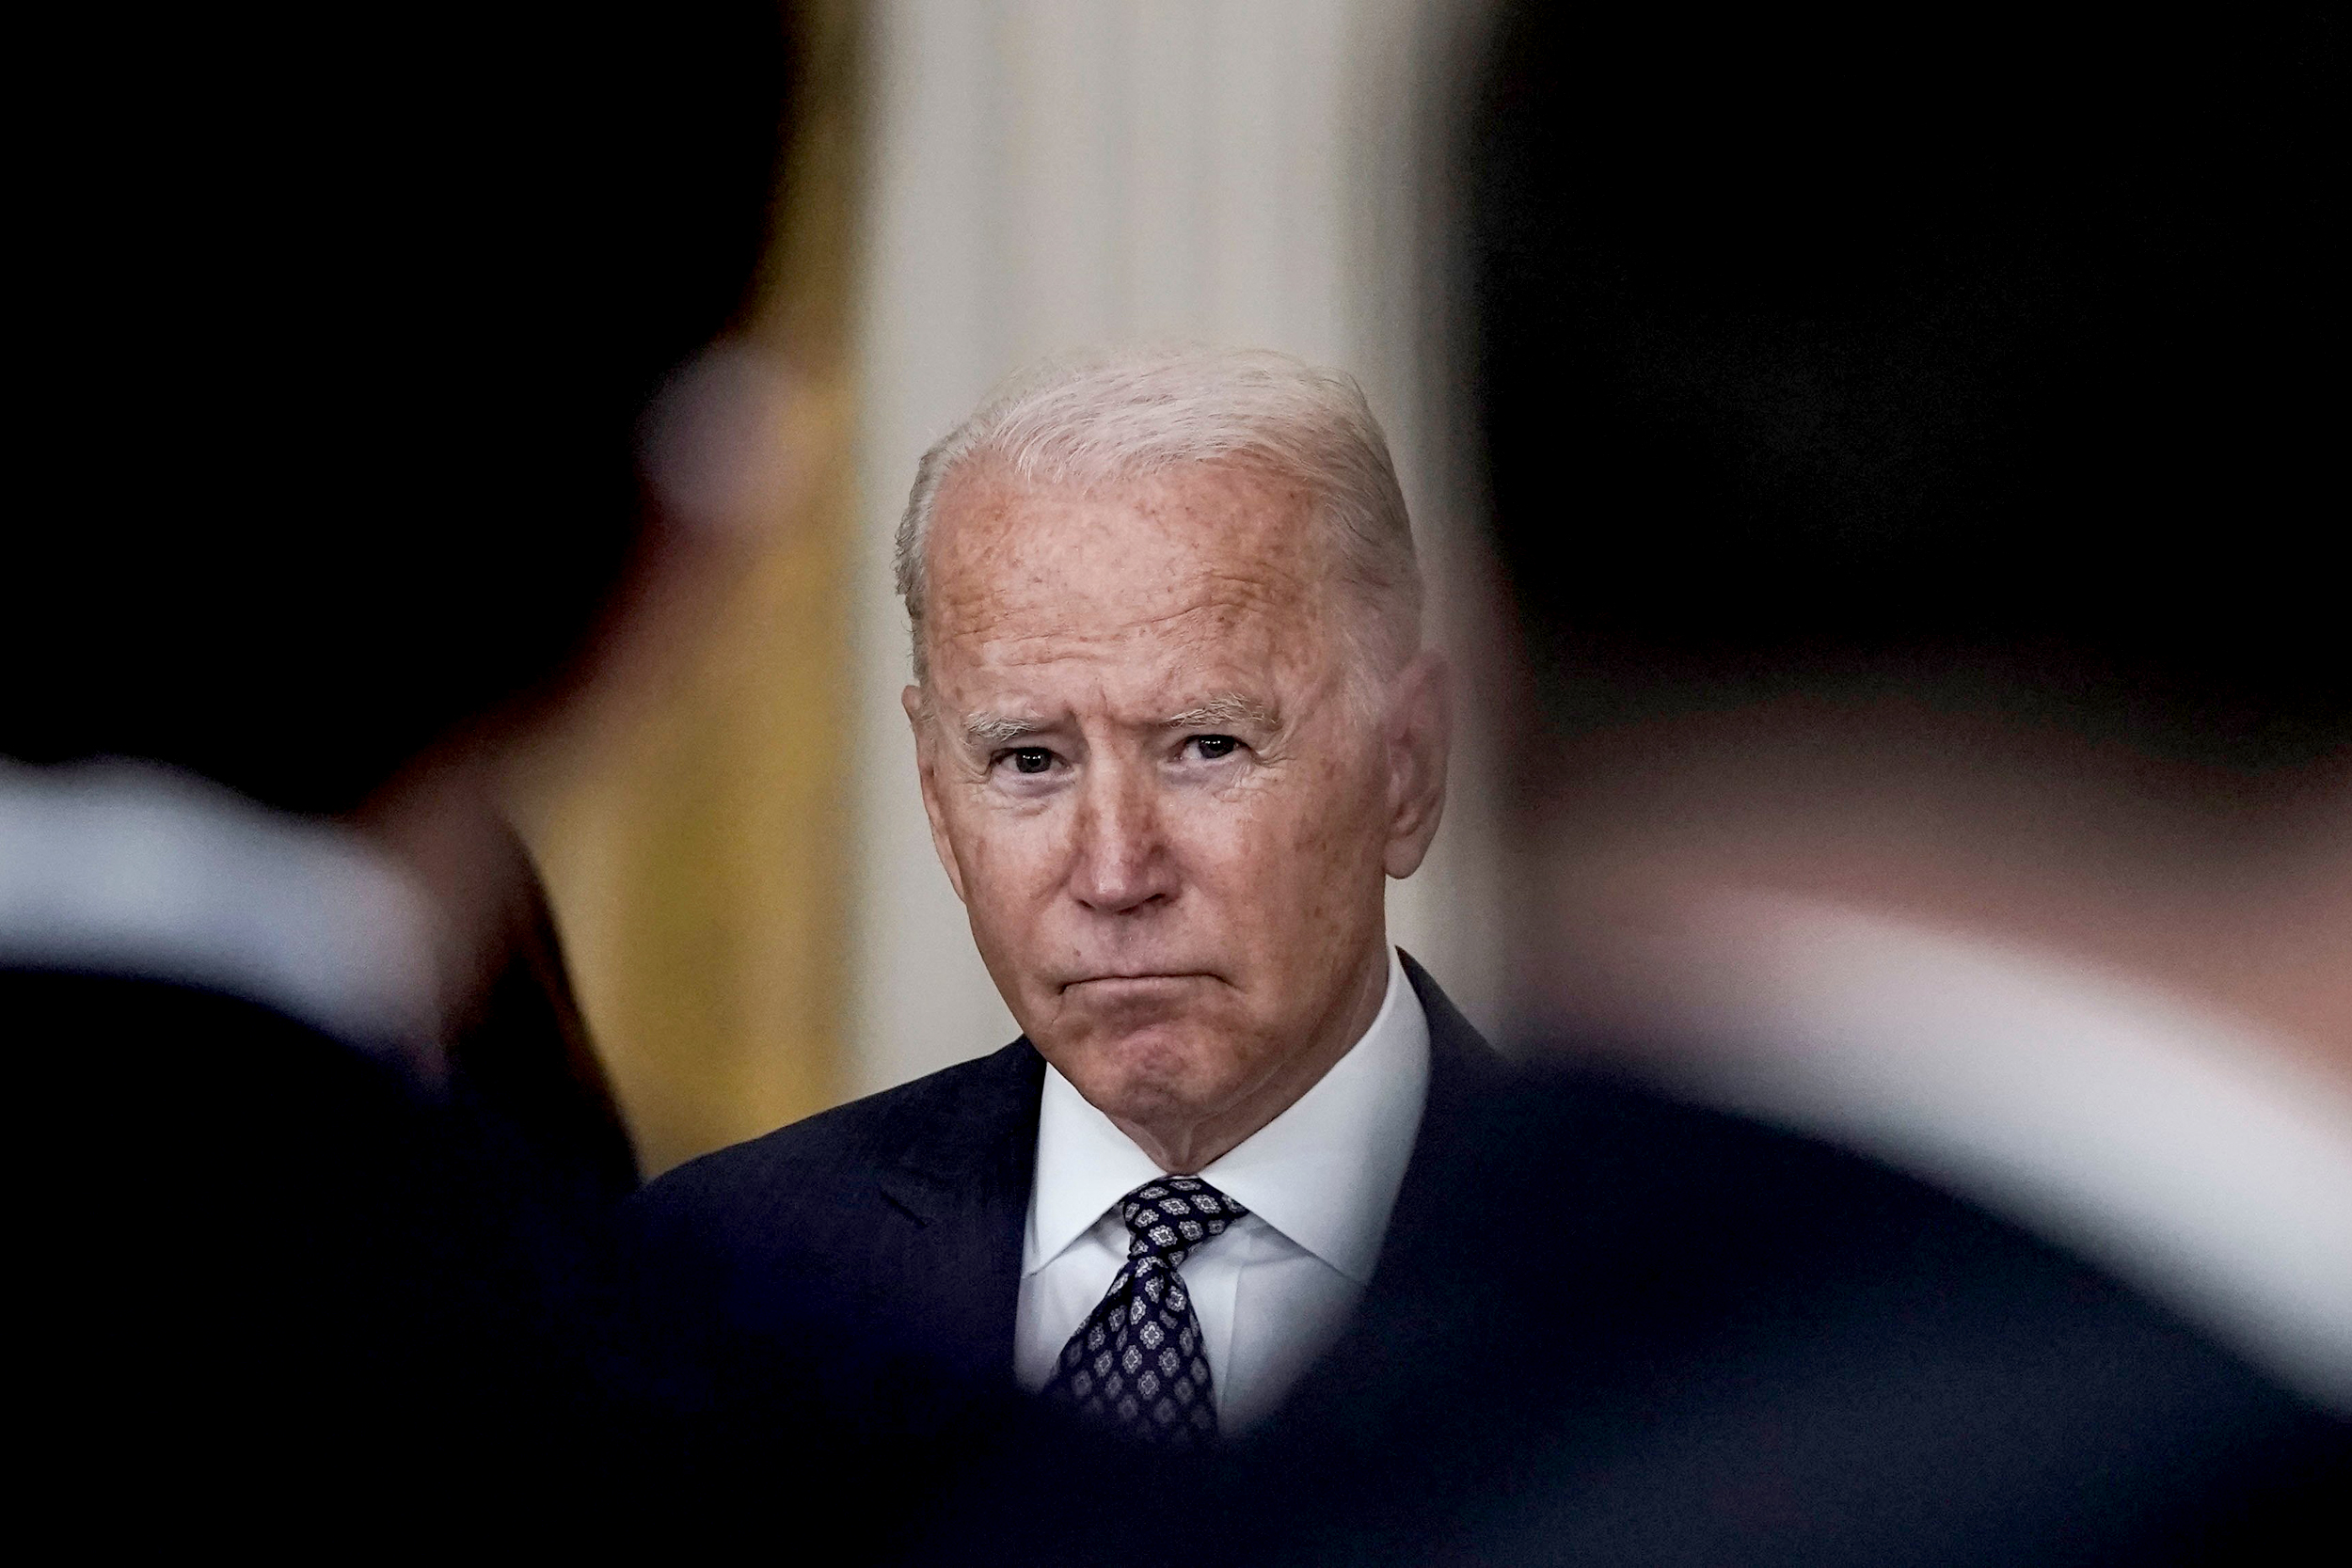 Biden to meet with Sens. Manchin, Sinema on Wednesday to discuss spending bill